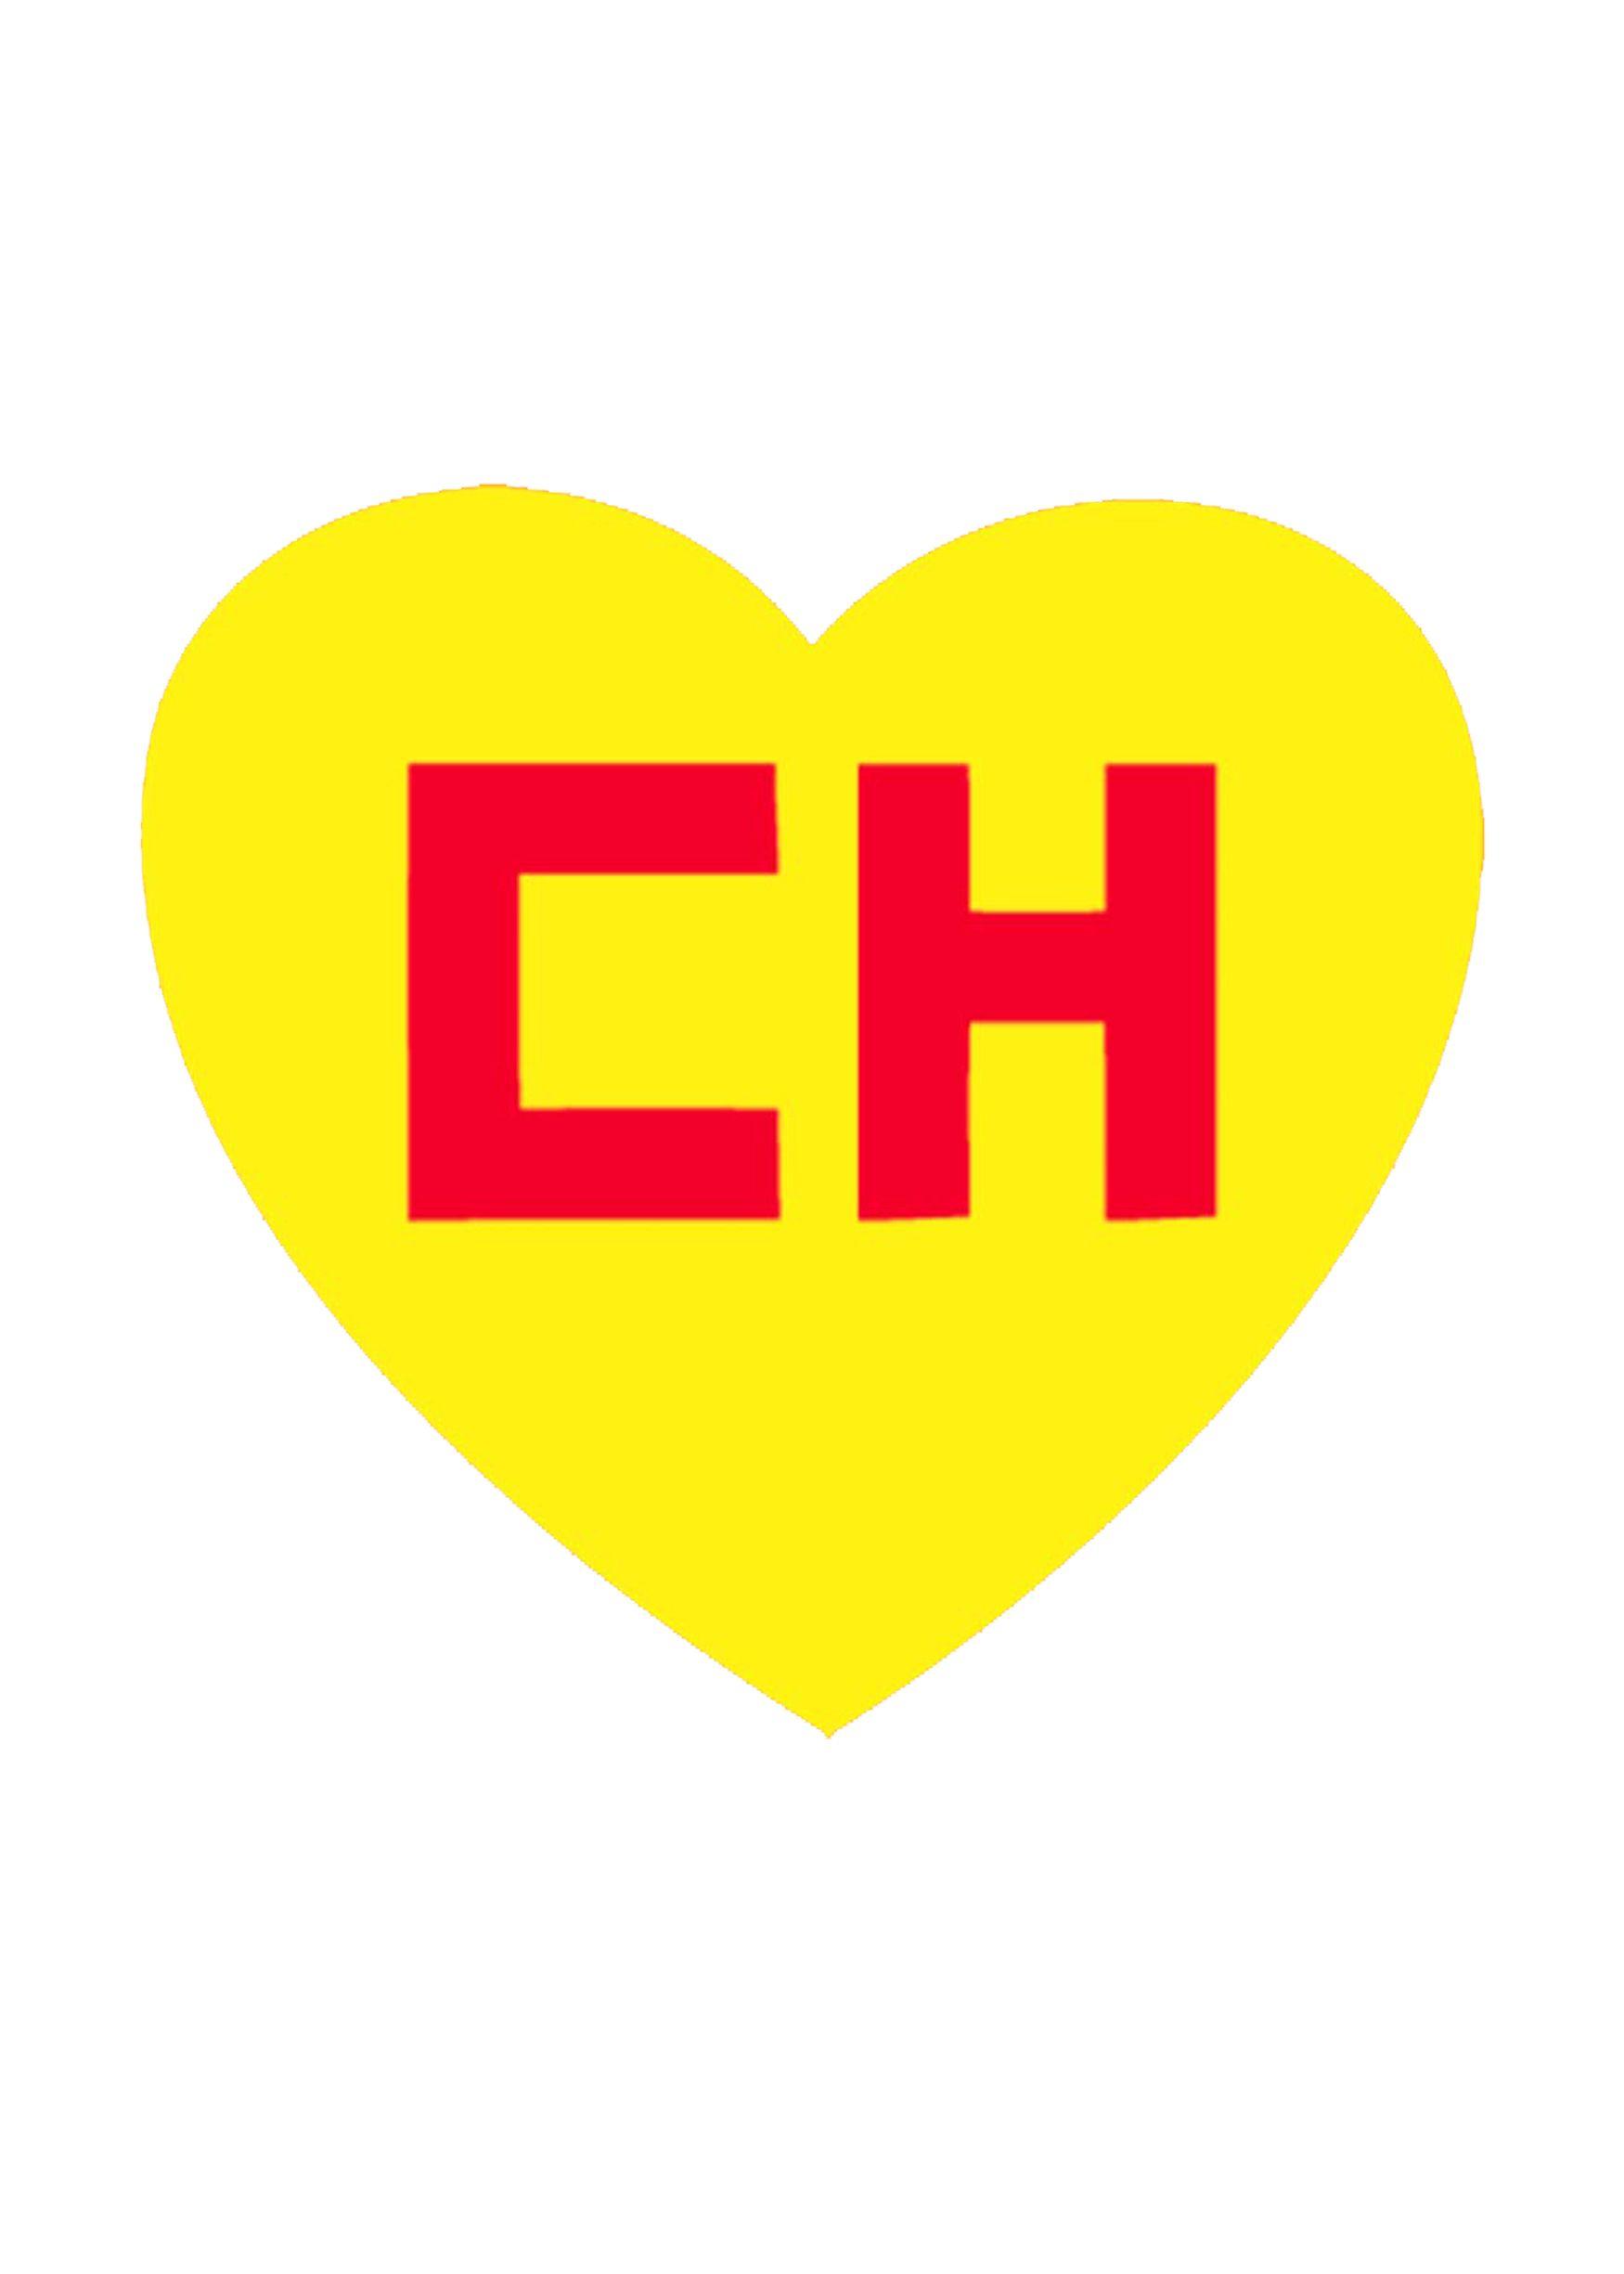 Pin Em El Chavo Del 8 La Chilindrina Birthday Invitations And Party Supplies